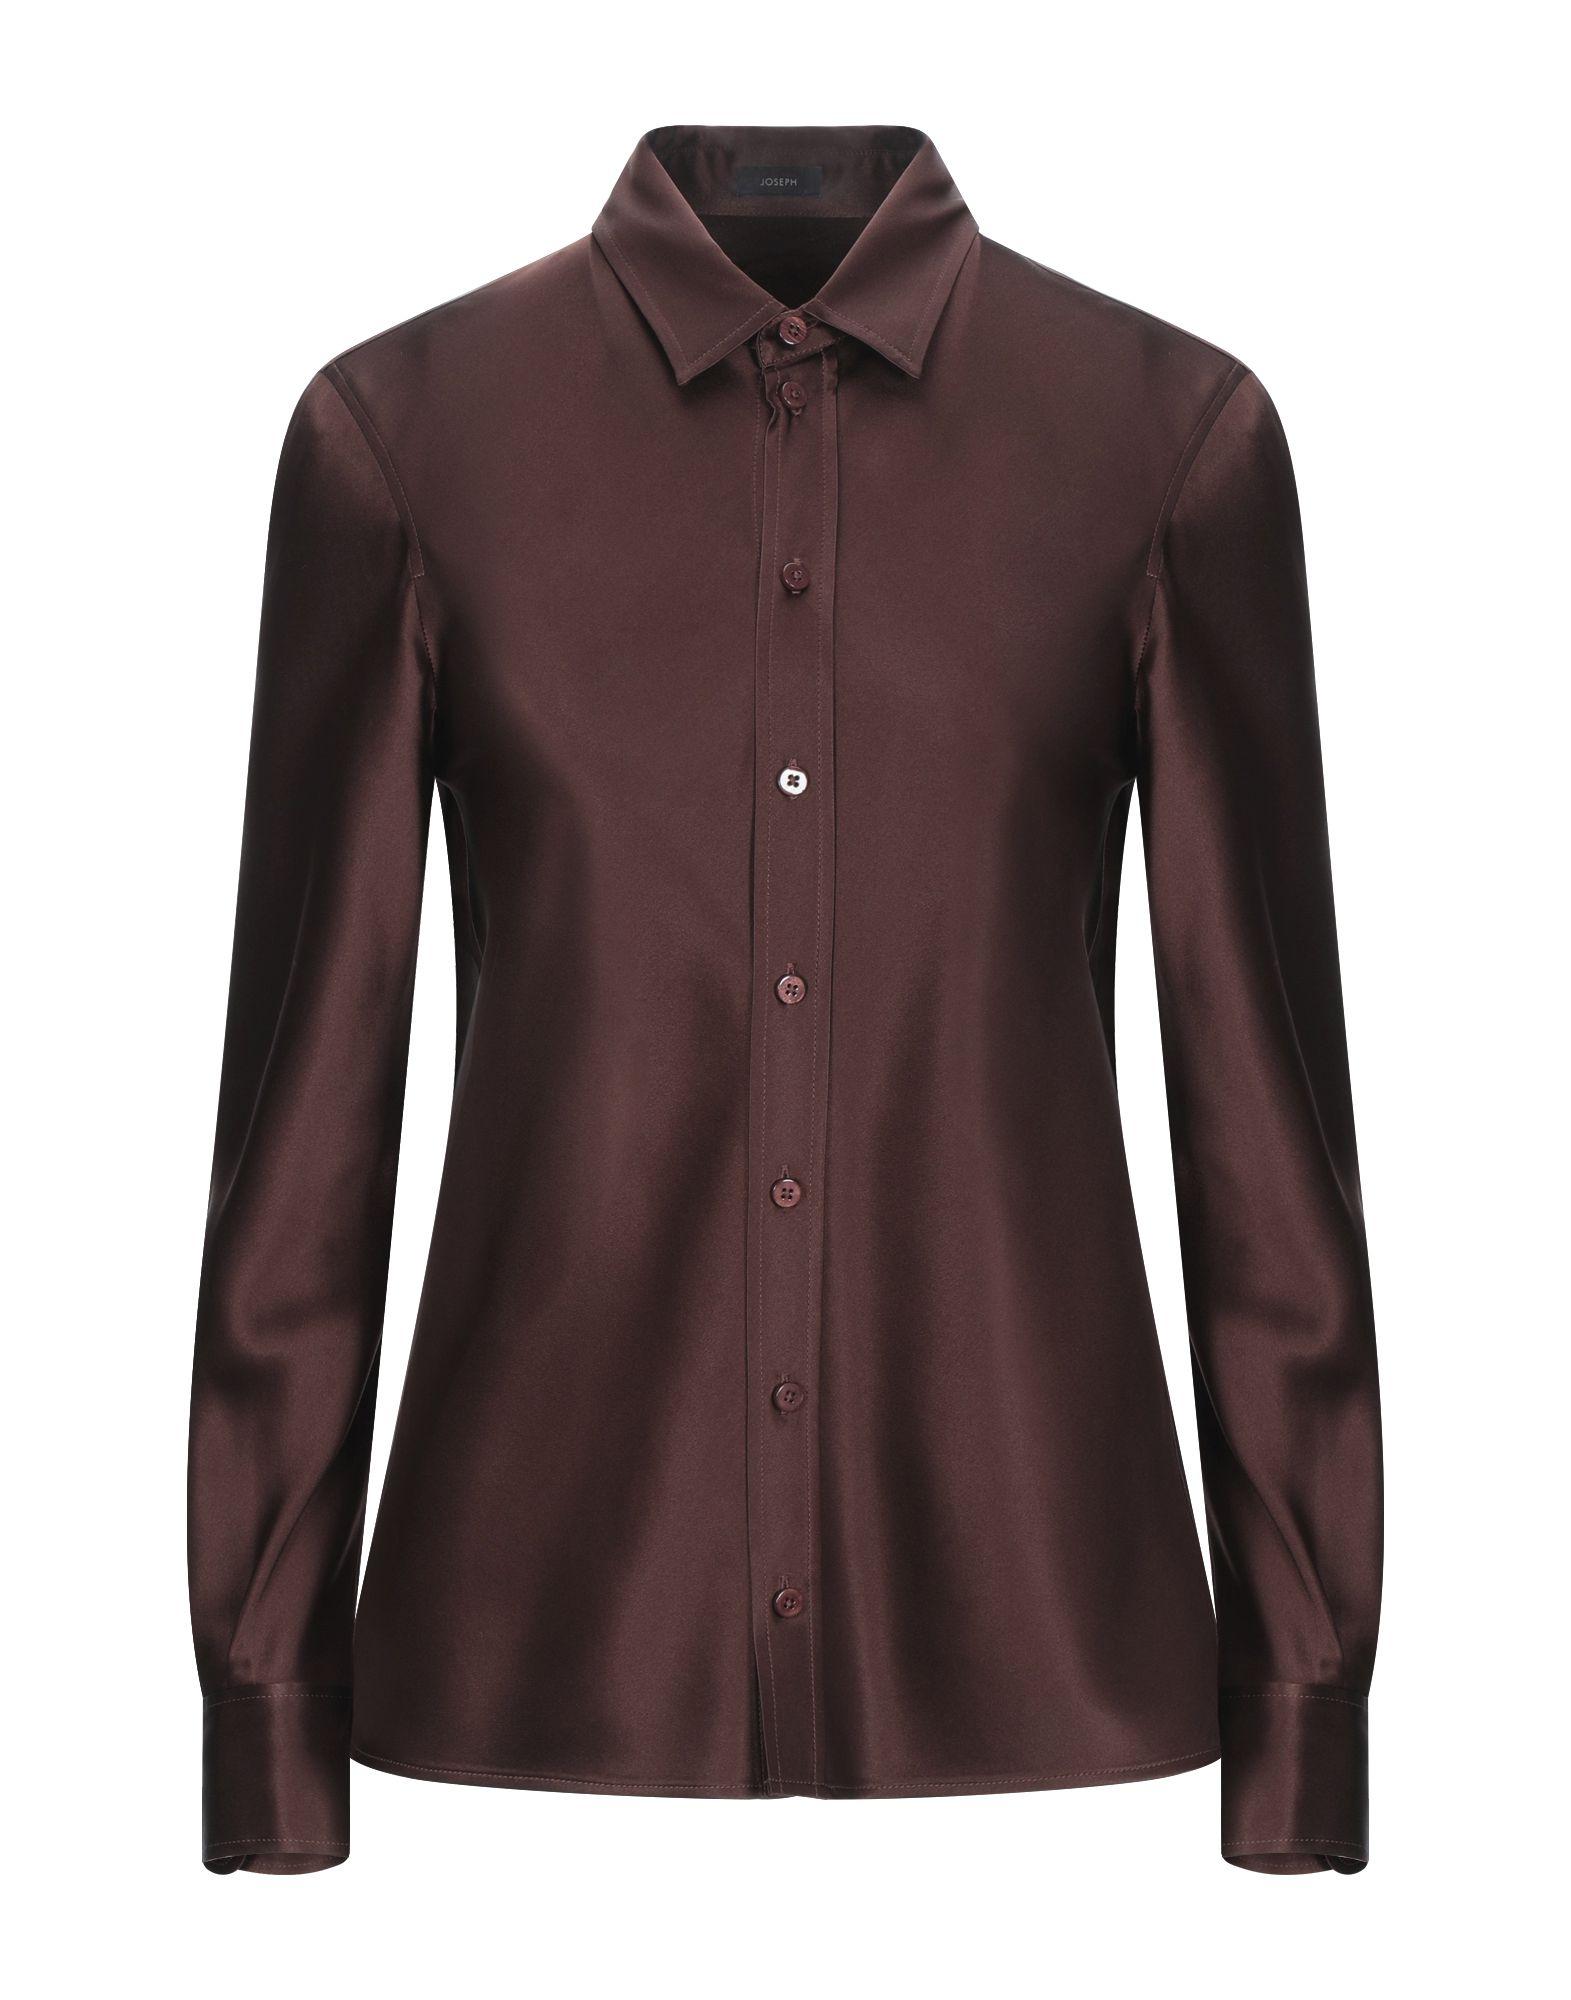 JOSEPH Shirts - Item 38916878